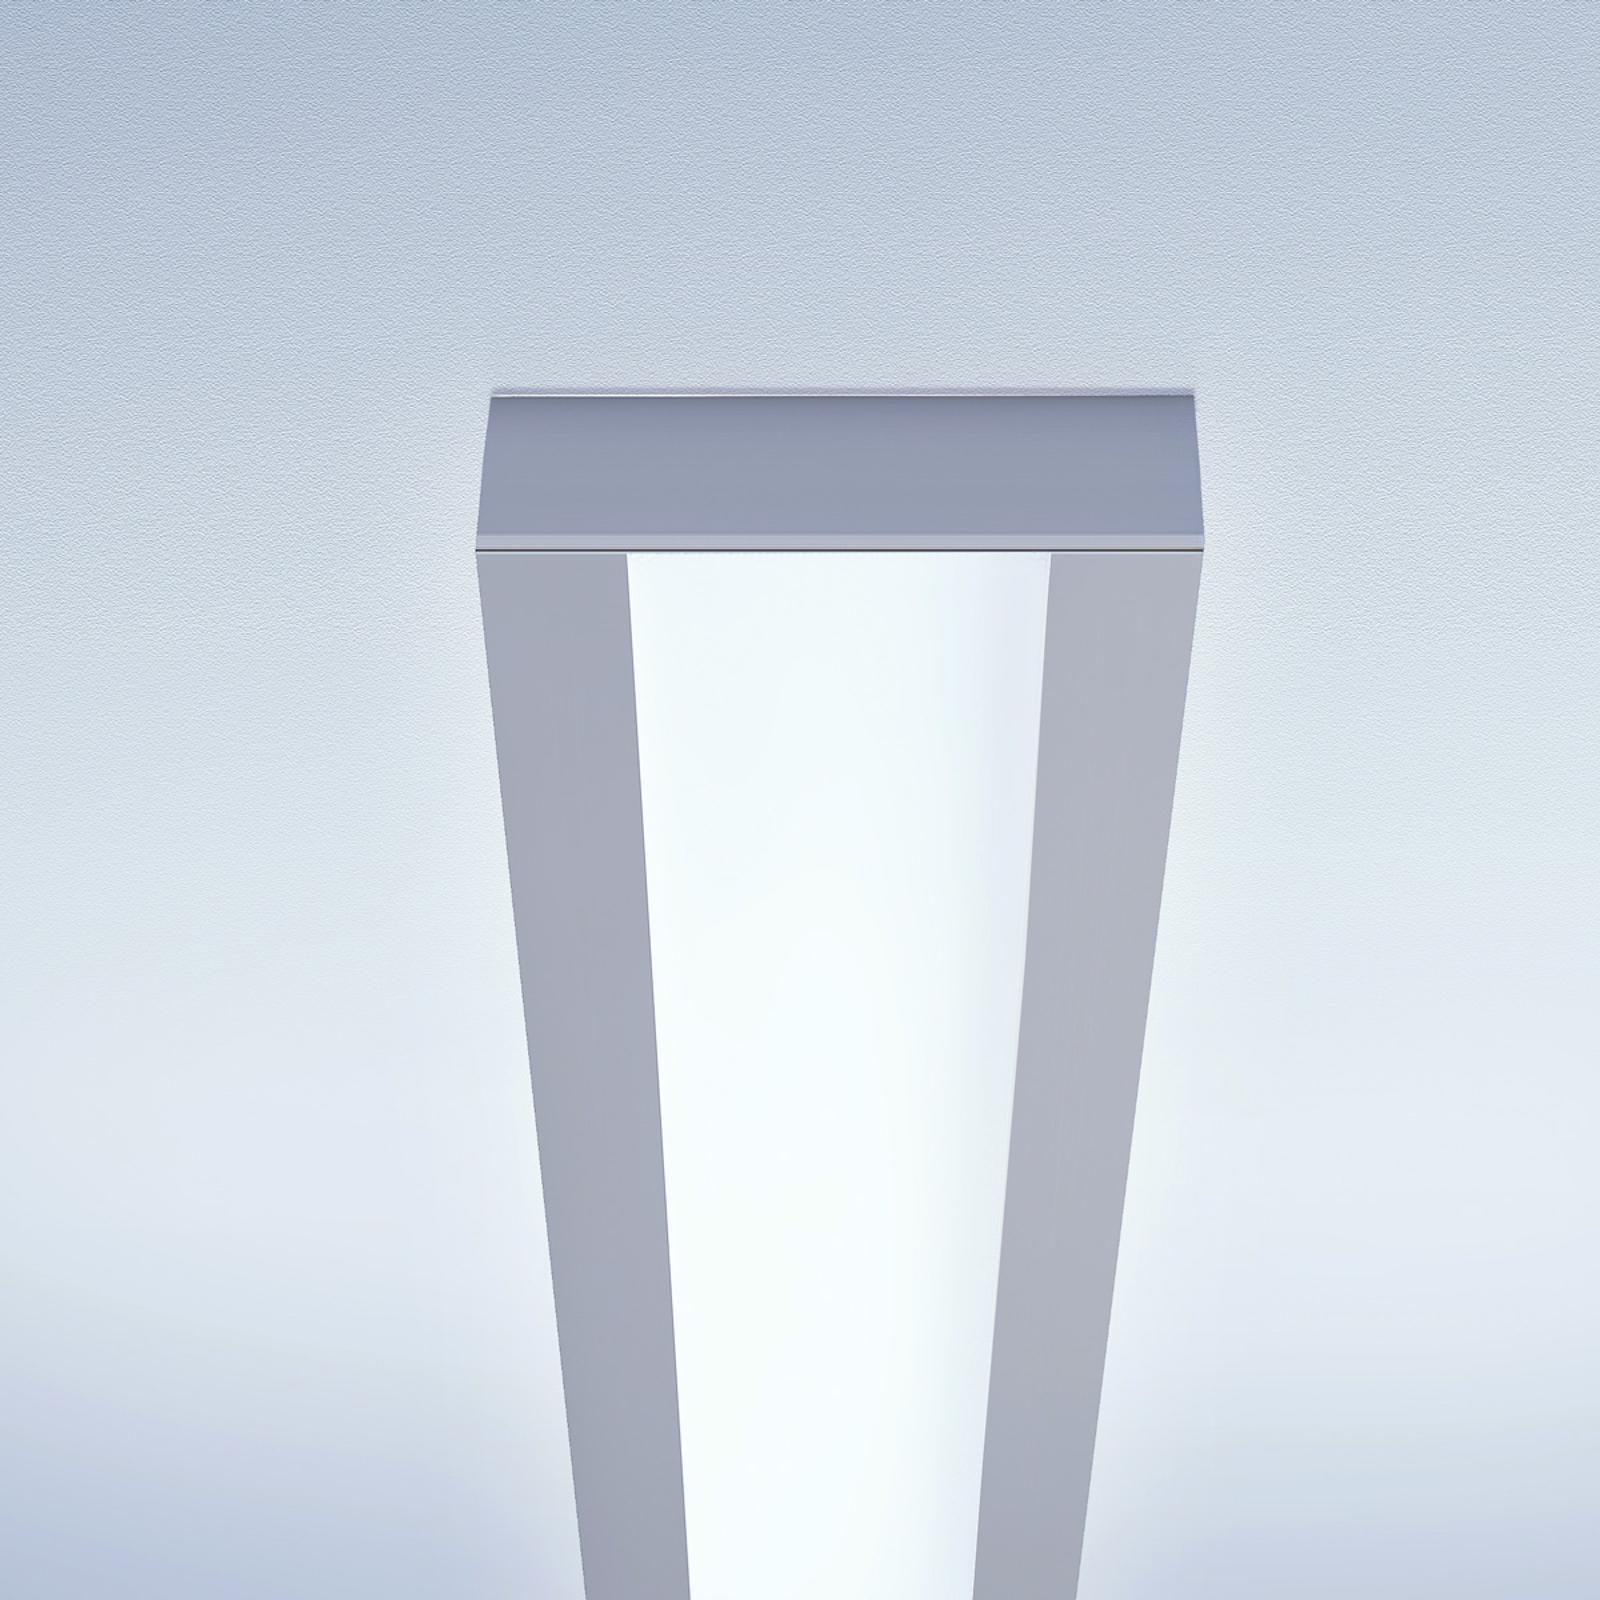 Pinta-asennuskattovalaisin Vison-A2 89 cm